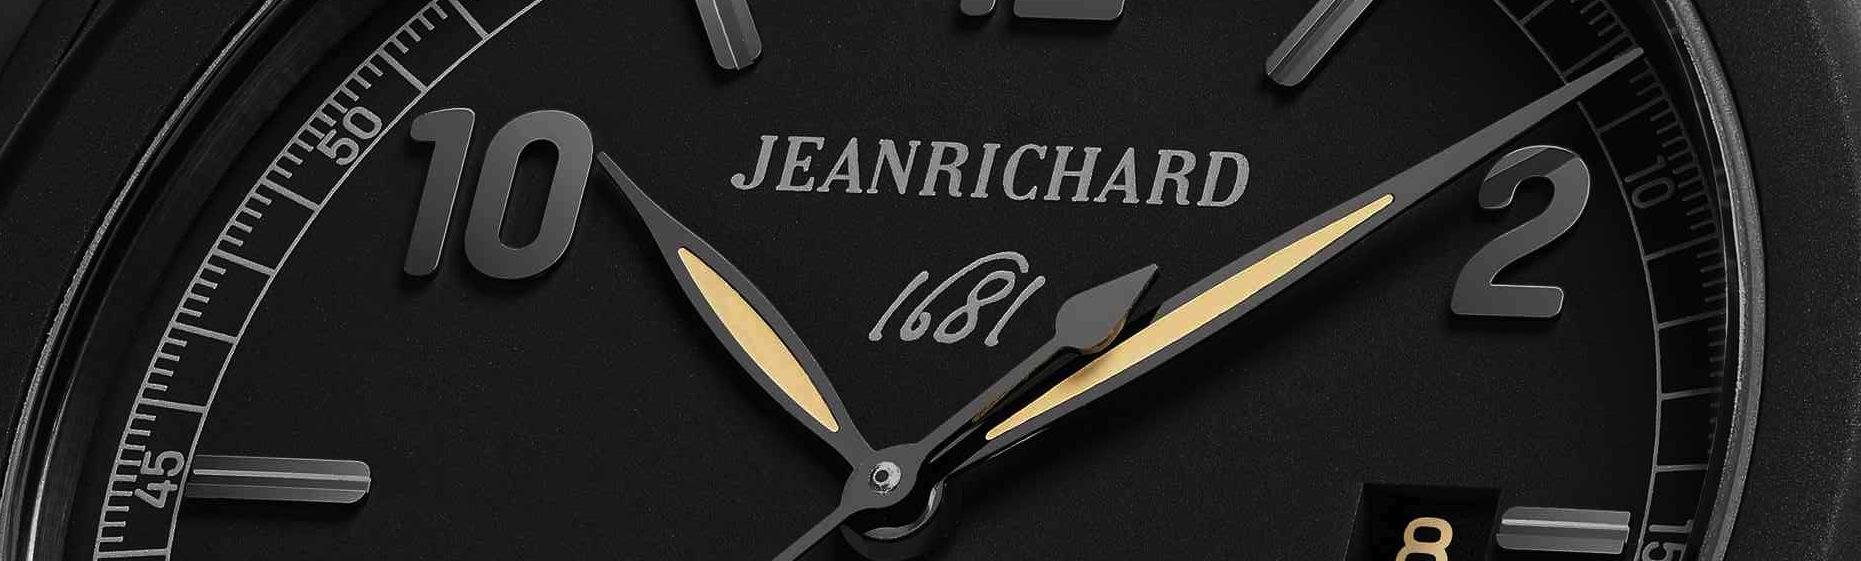 Jean Richard 1681 Black